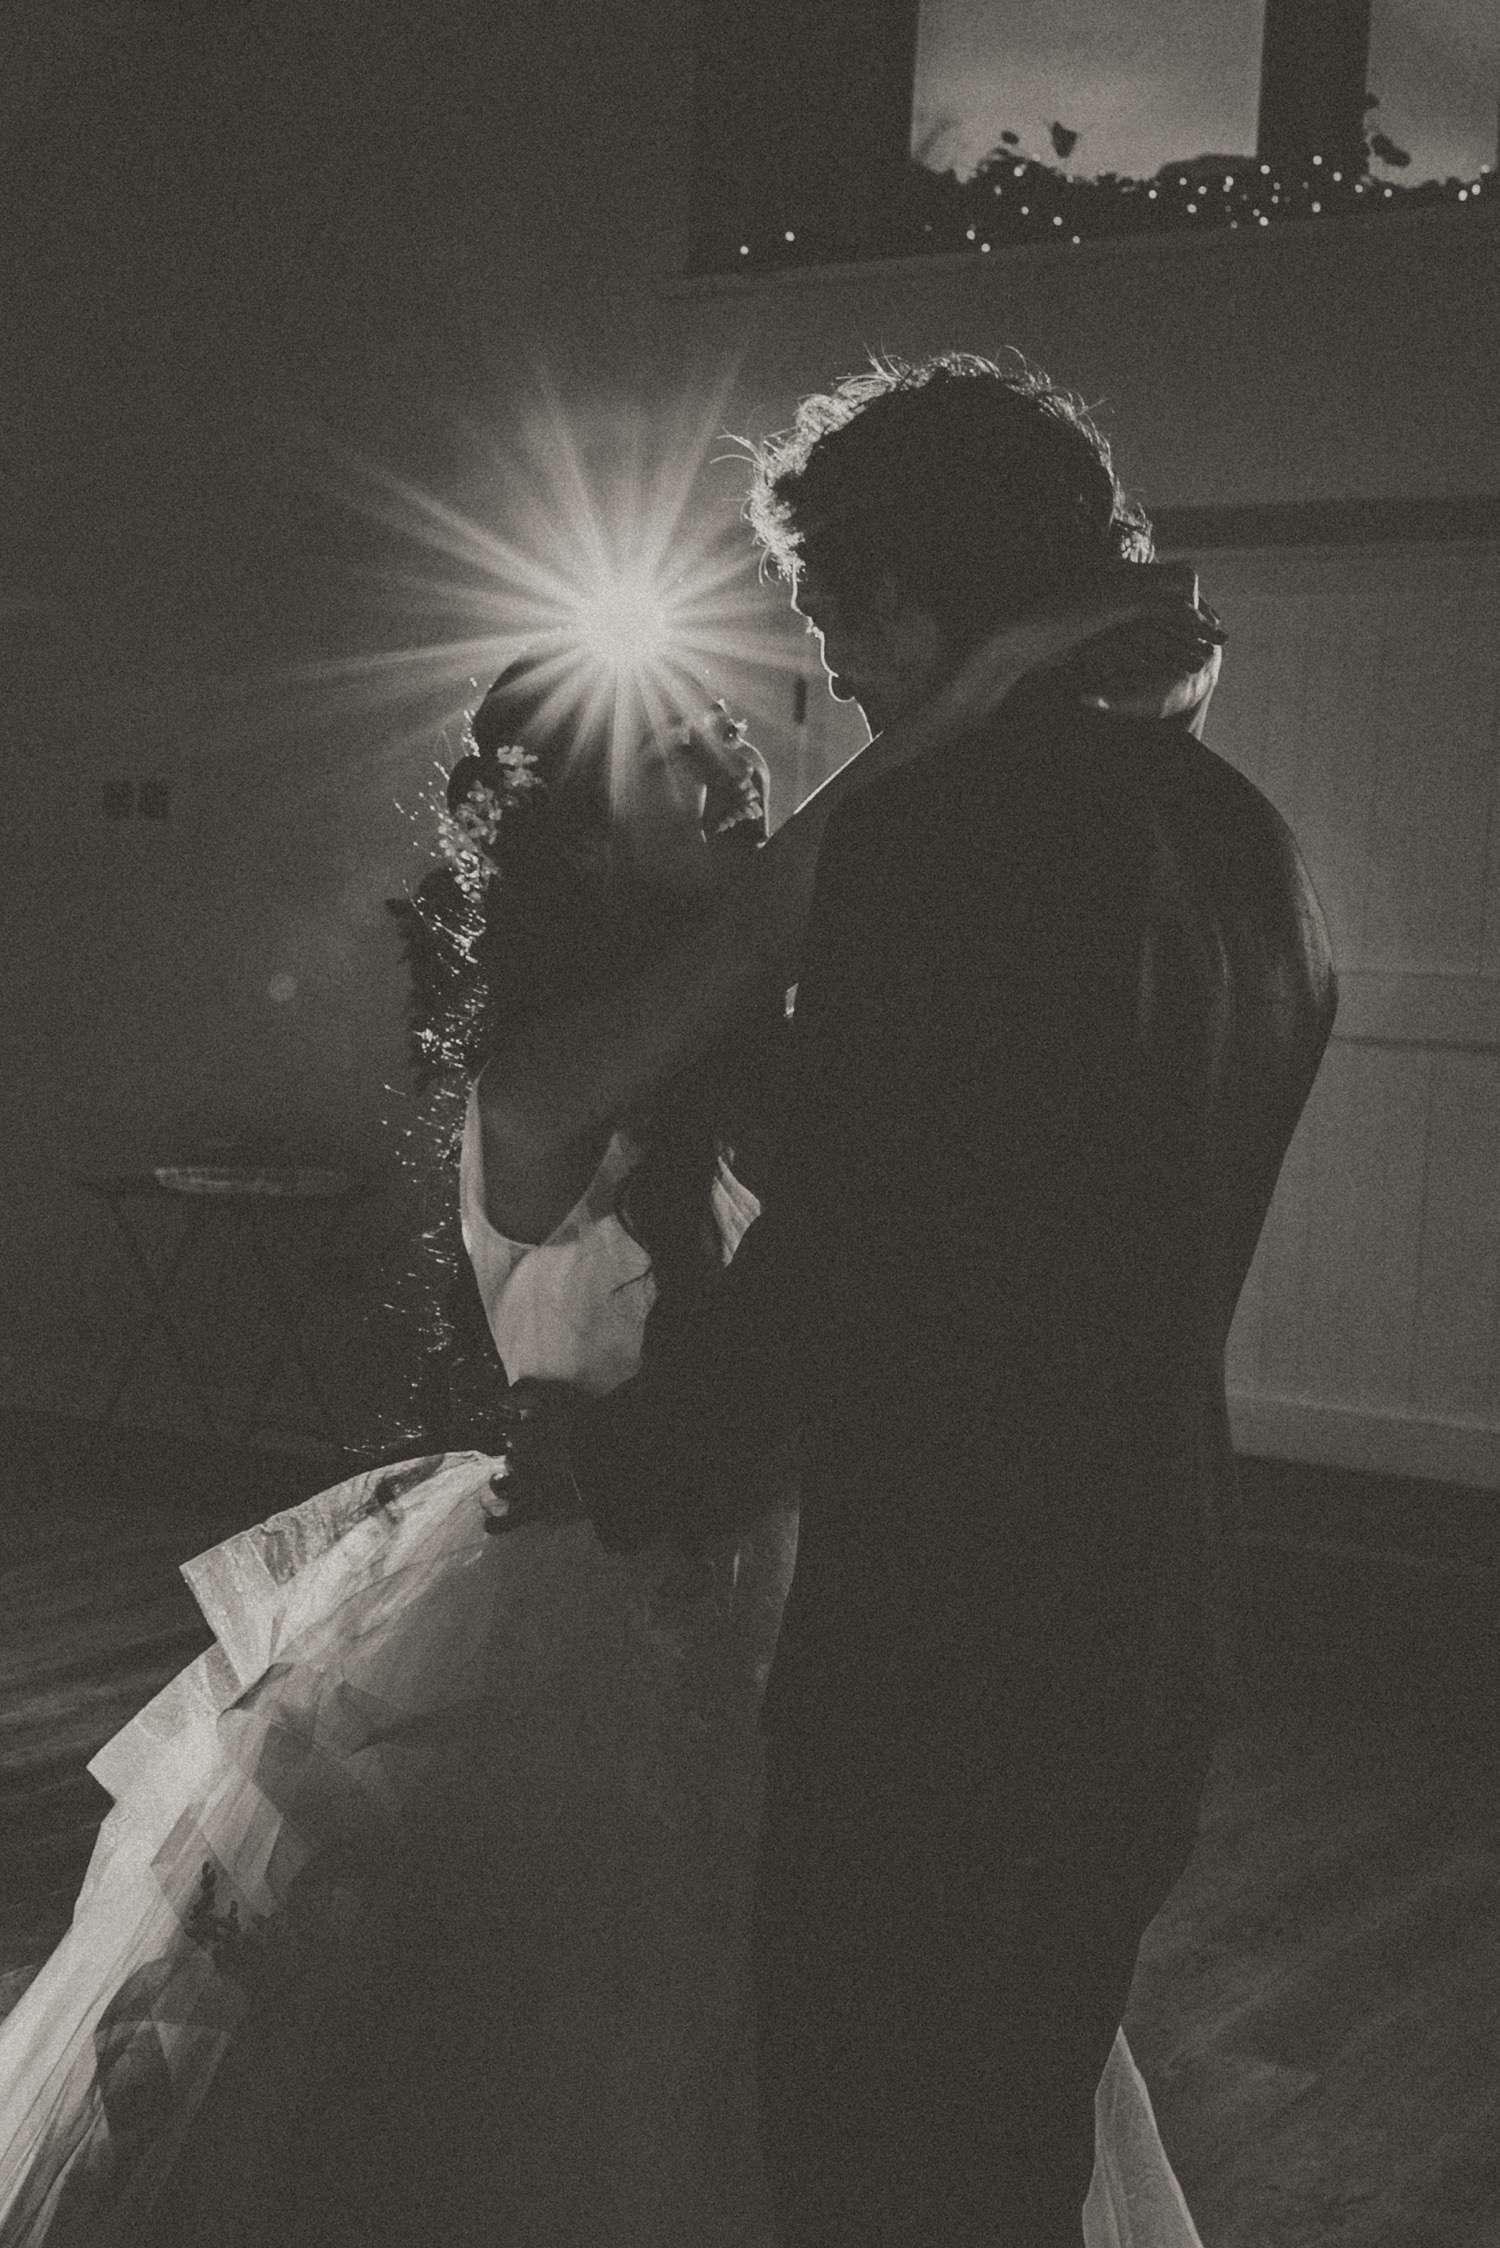 darlington-wedding-photographer-wedding-photography-darlington-91.jpg